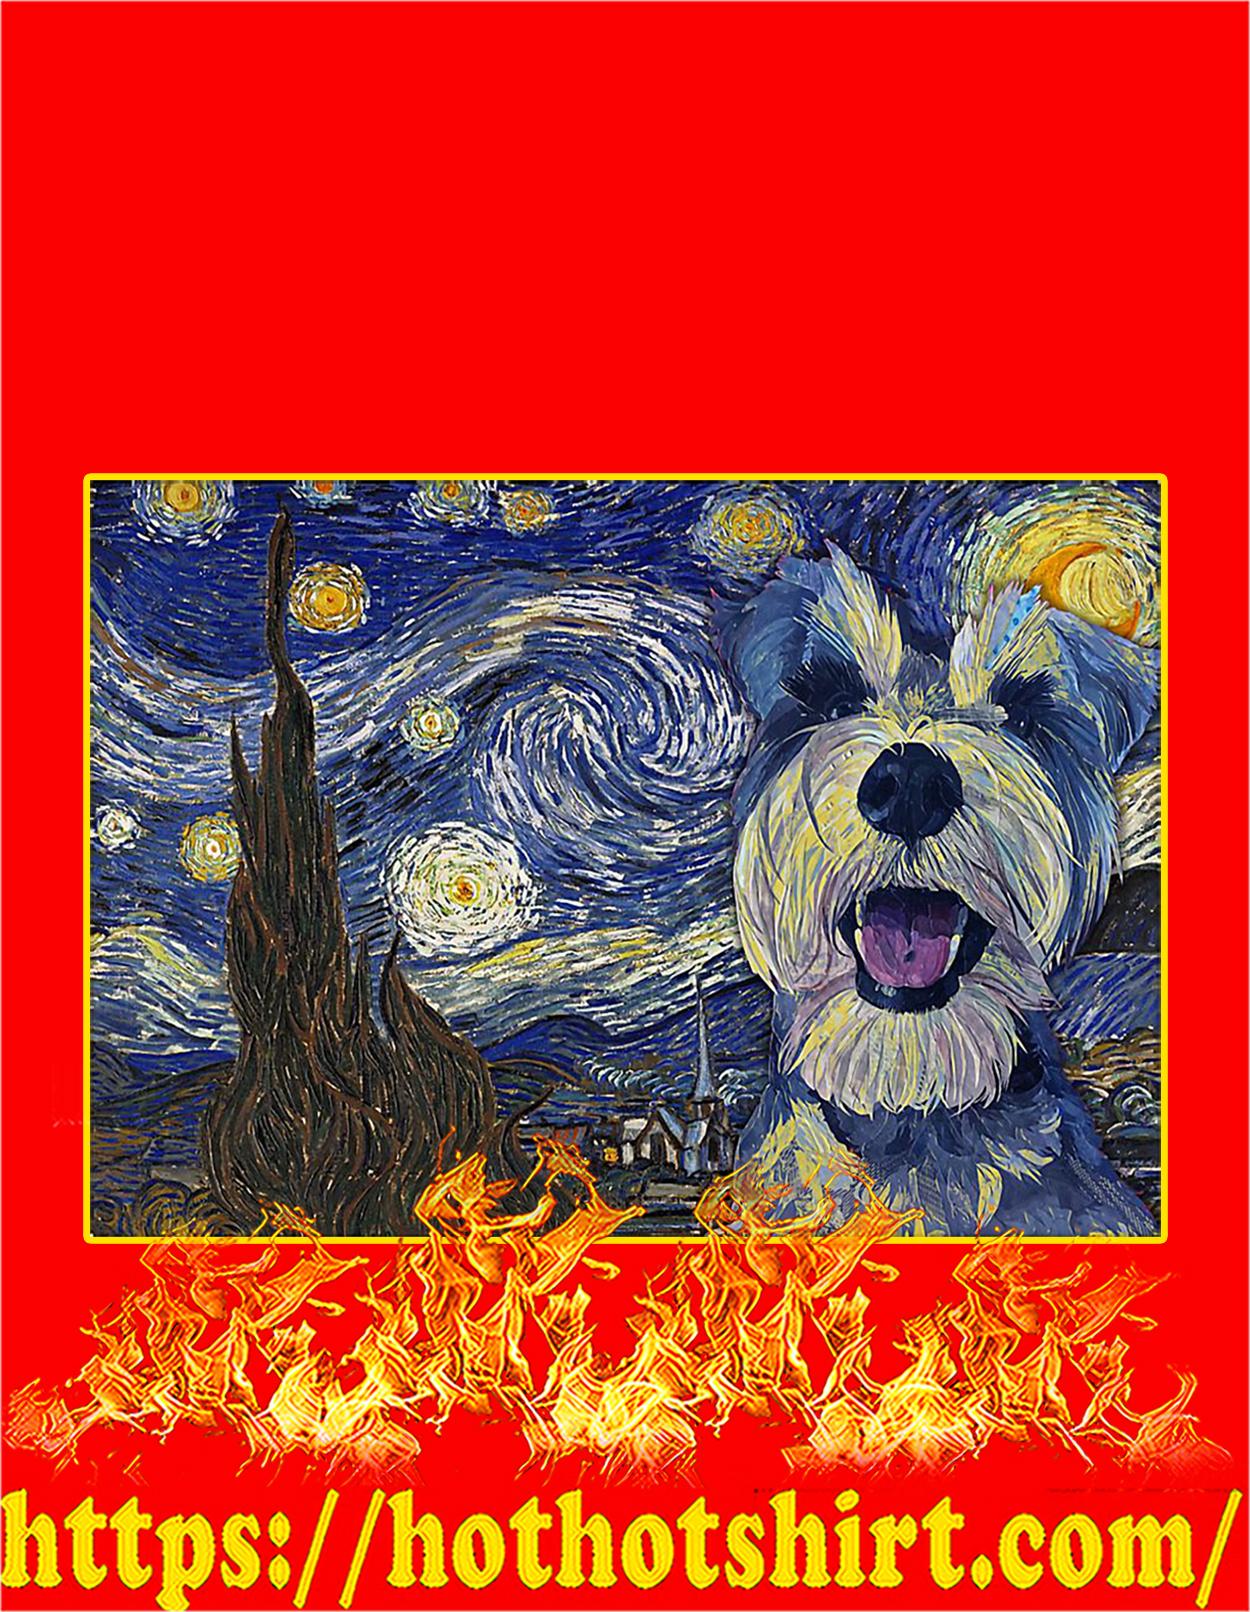 Schnauzer starry night van gogh poster - A2